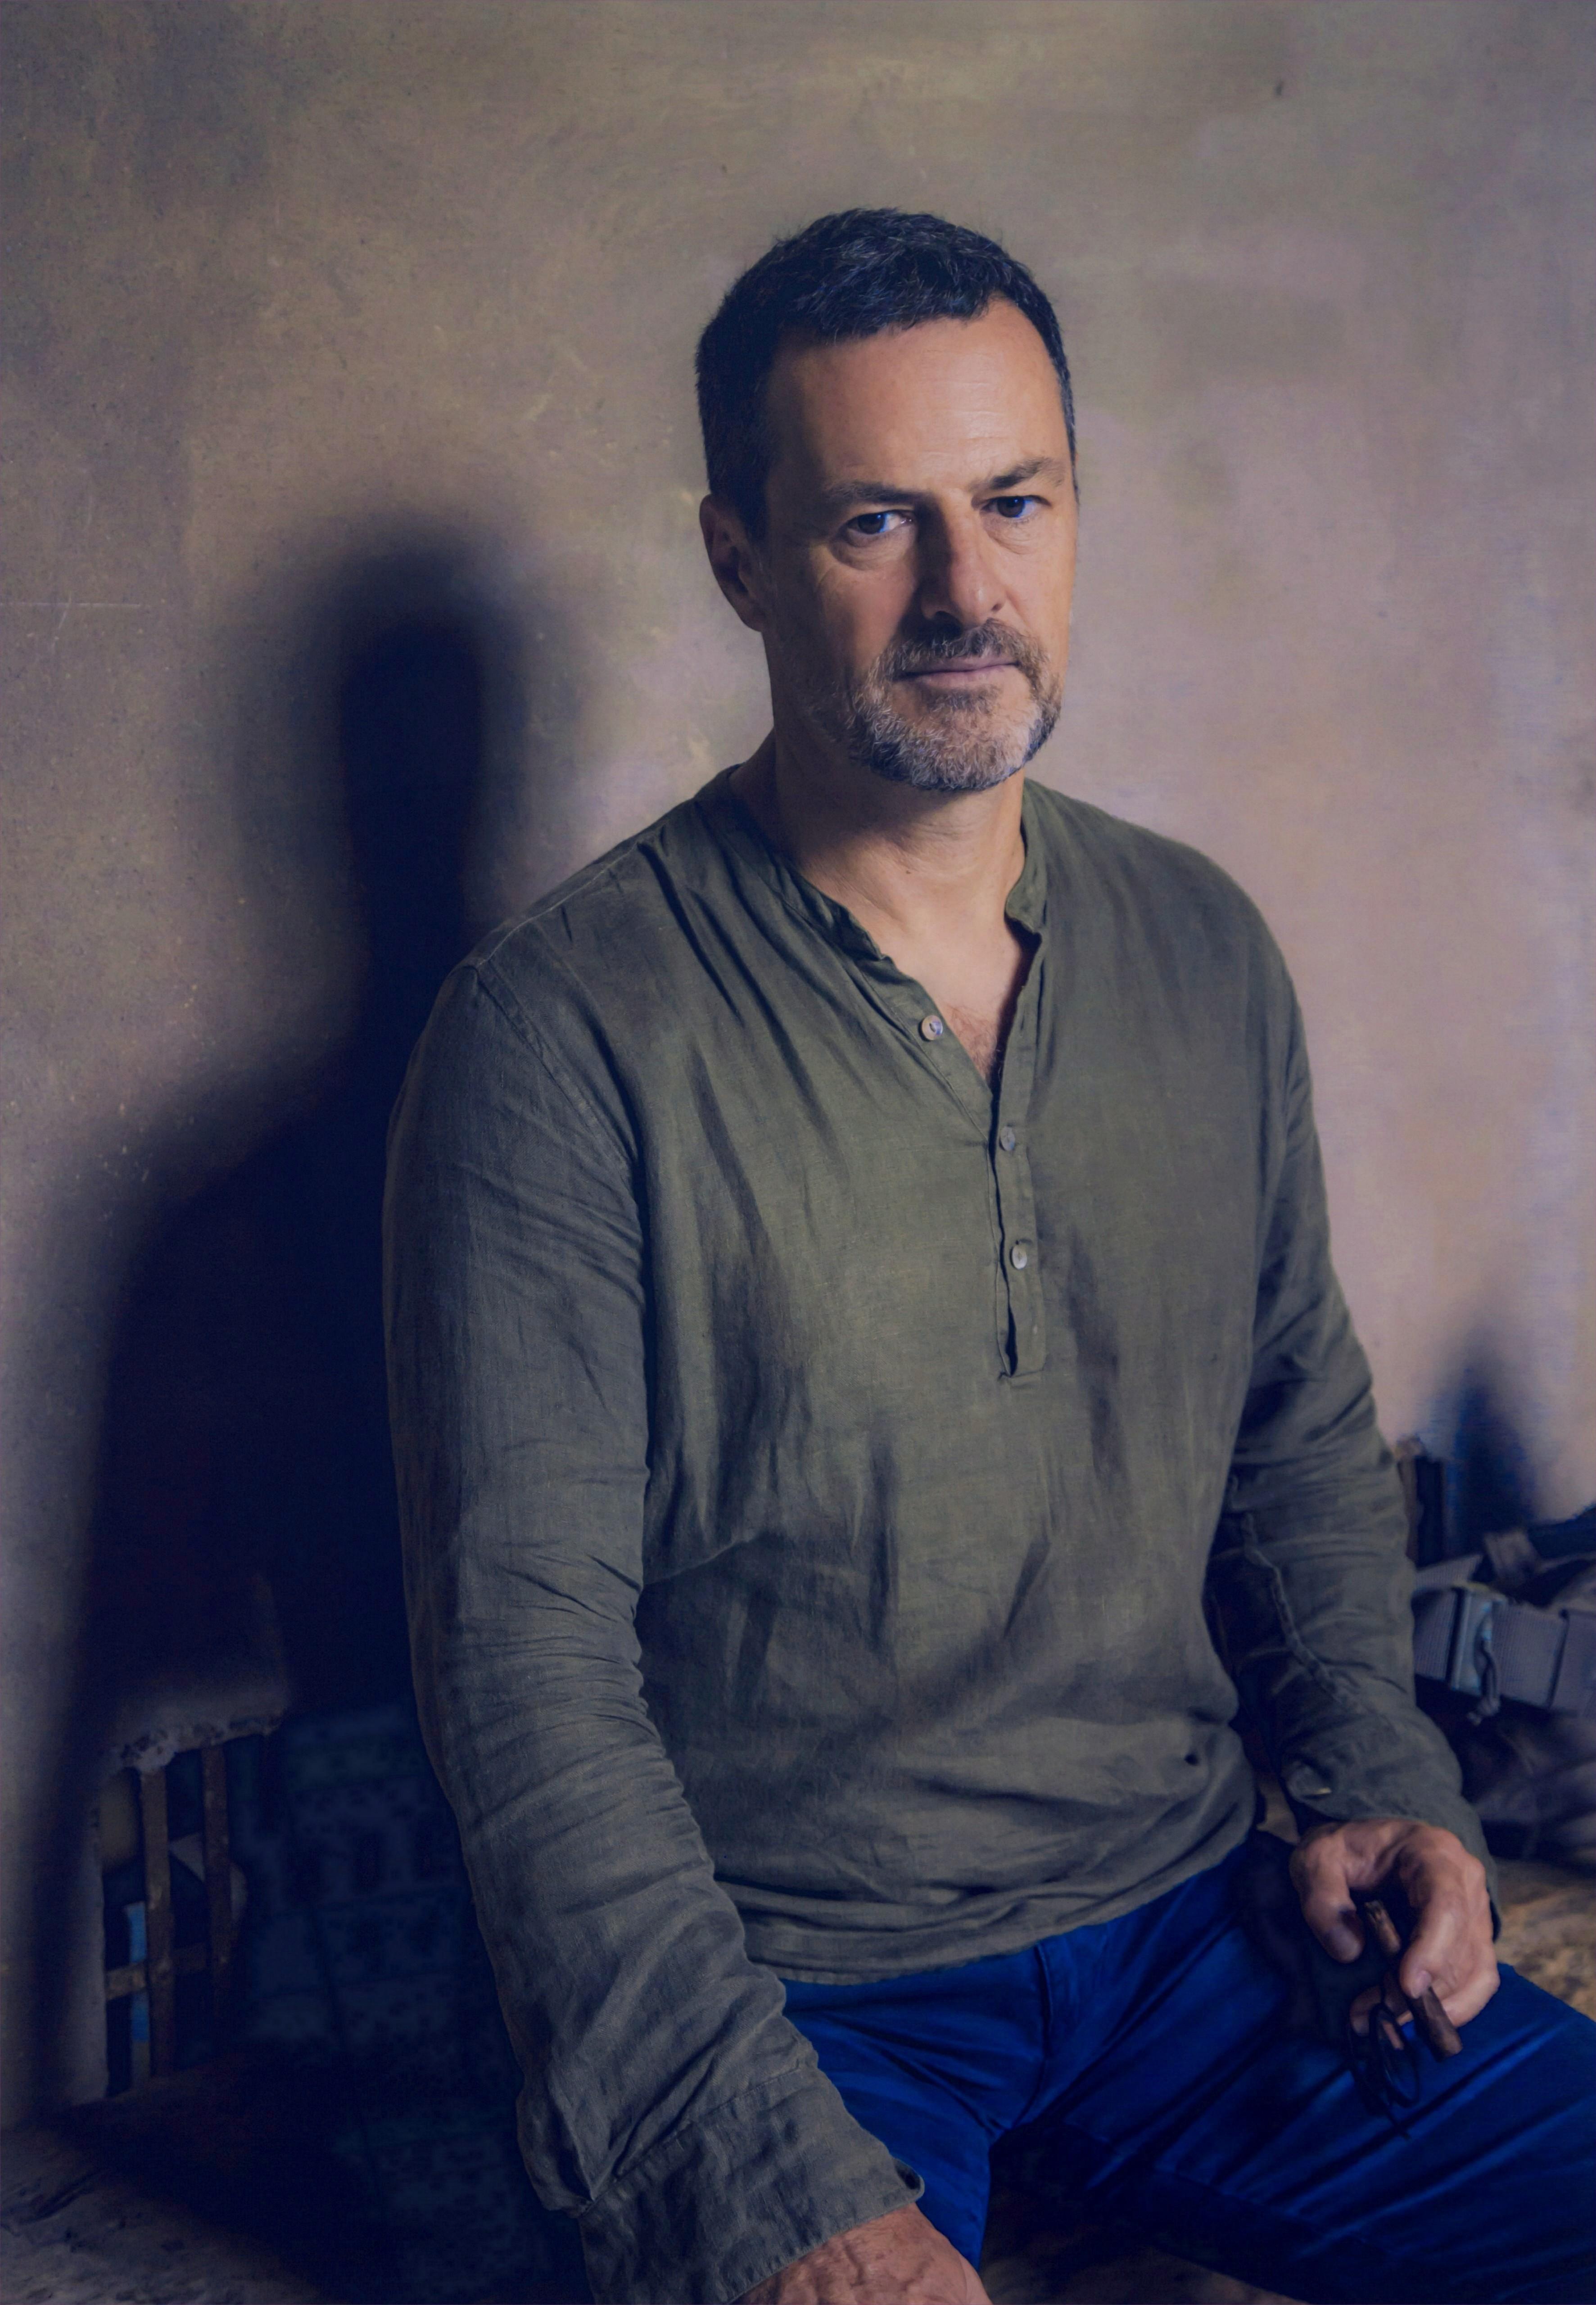 Italian writer Carlo Pizzati